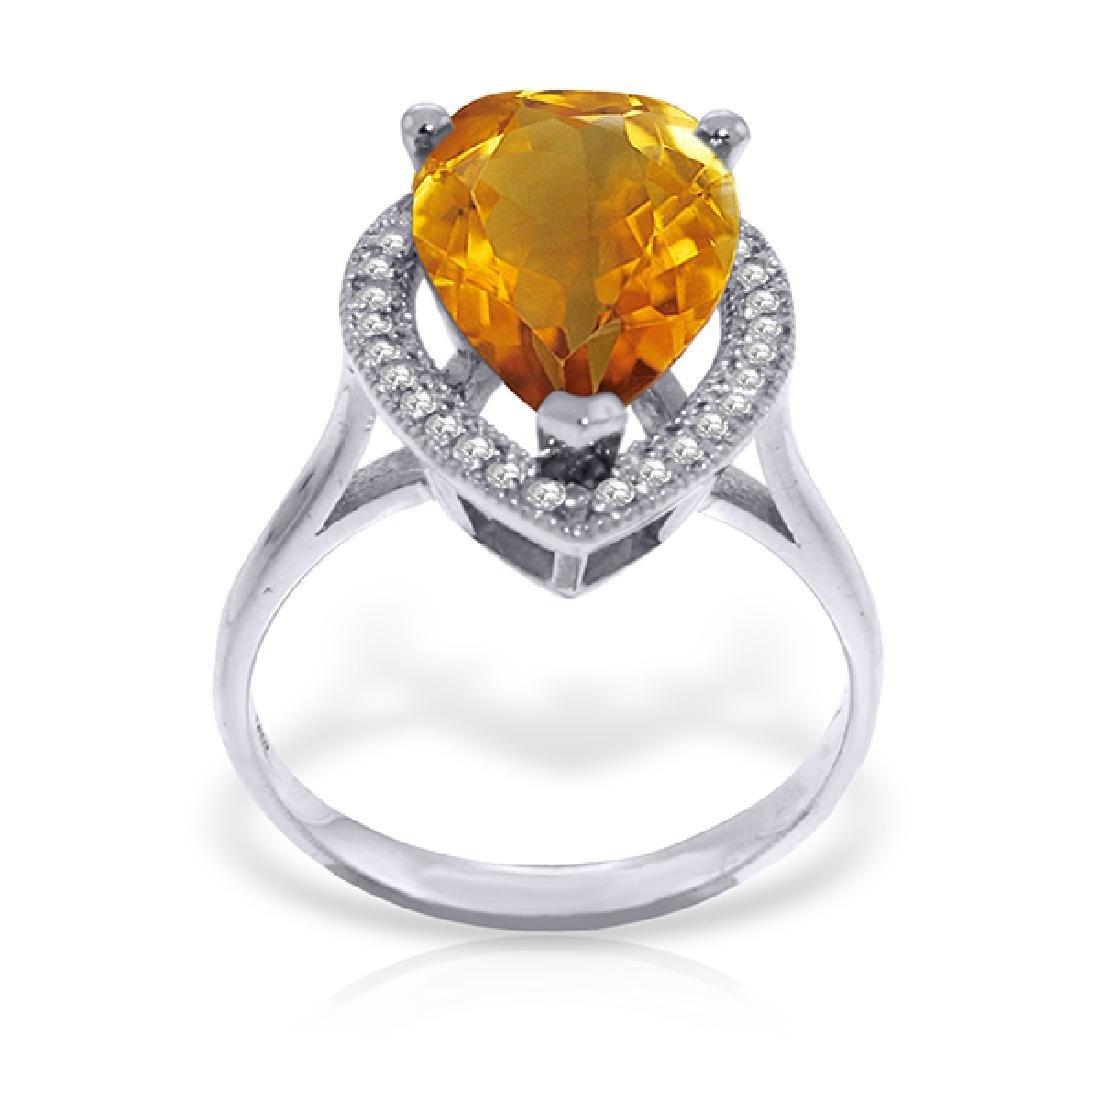 Genuine 3.41 ctw Citrine & Diamond Ring Jewelry 14KT